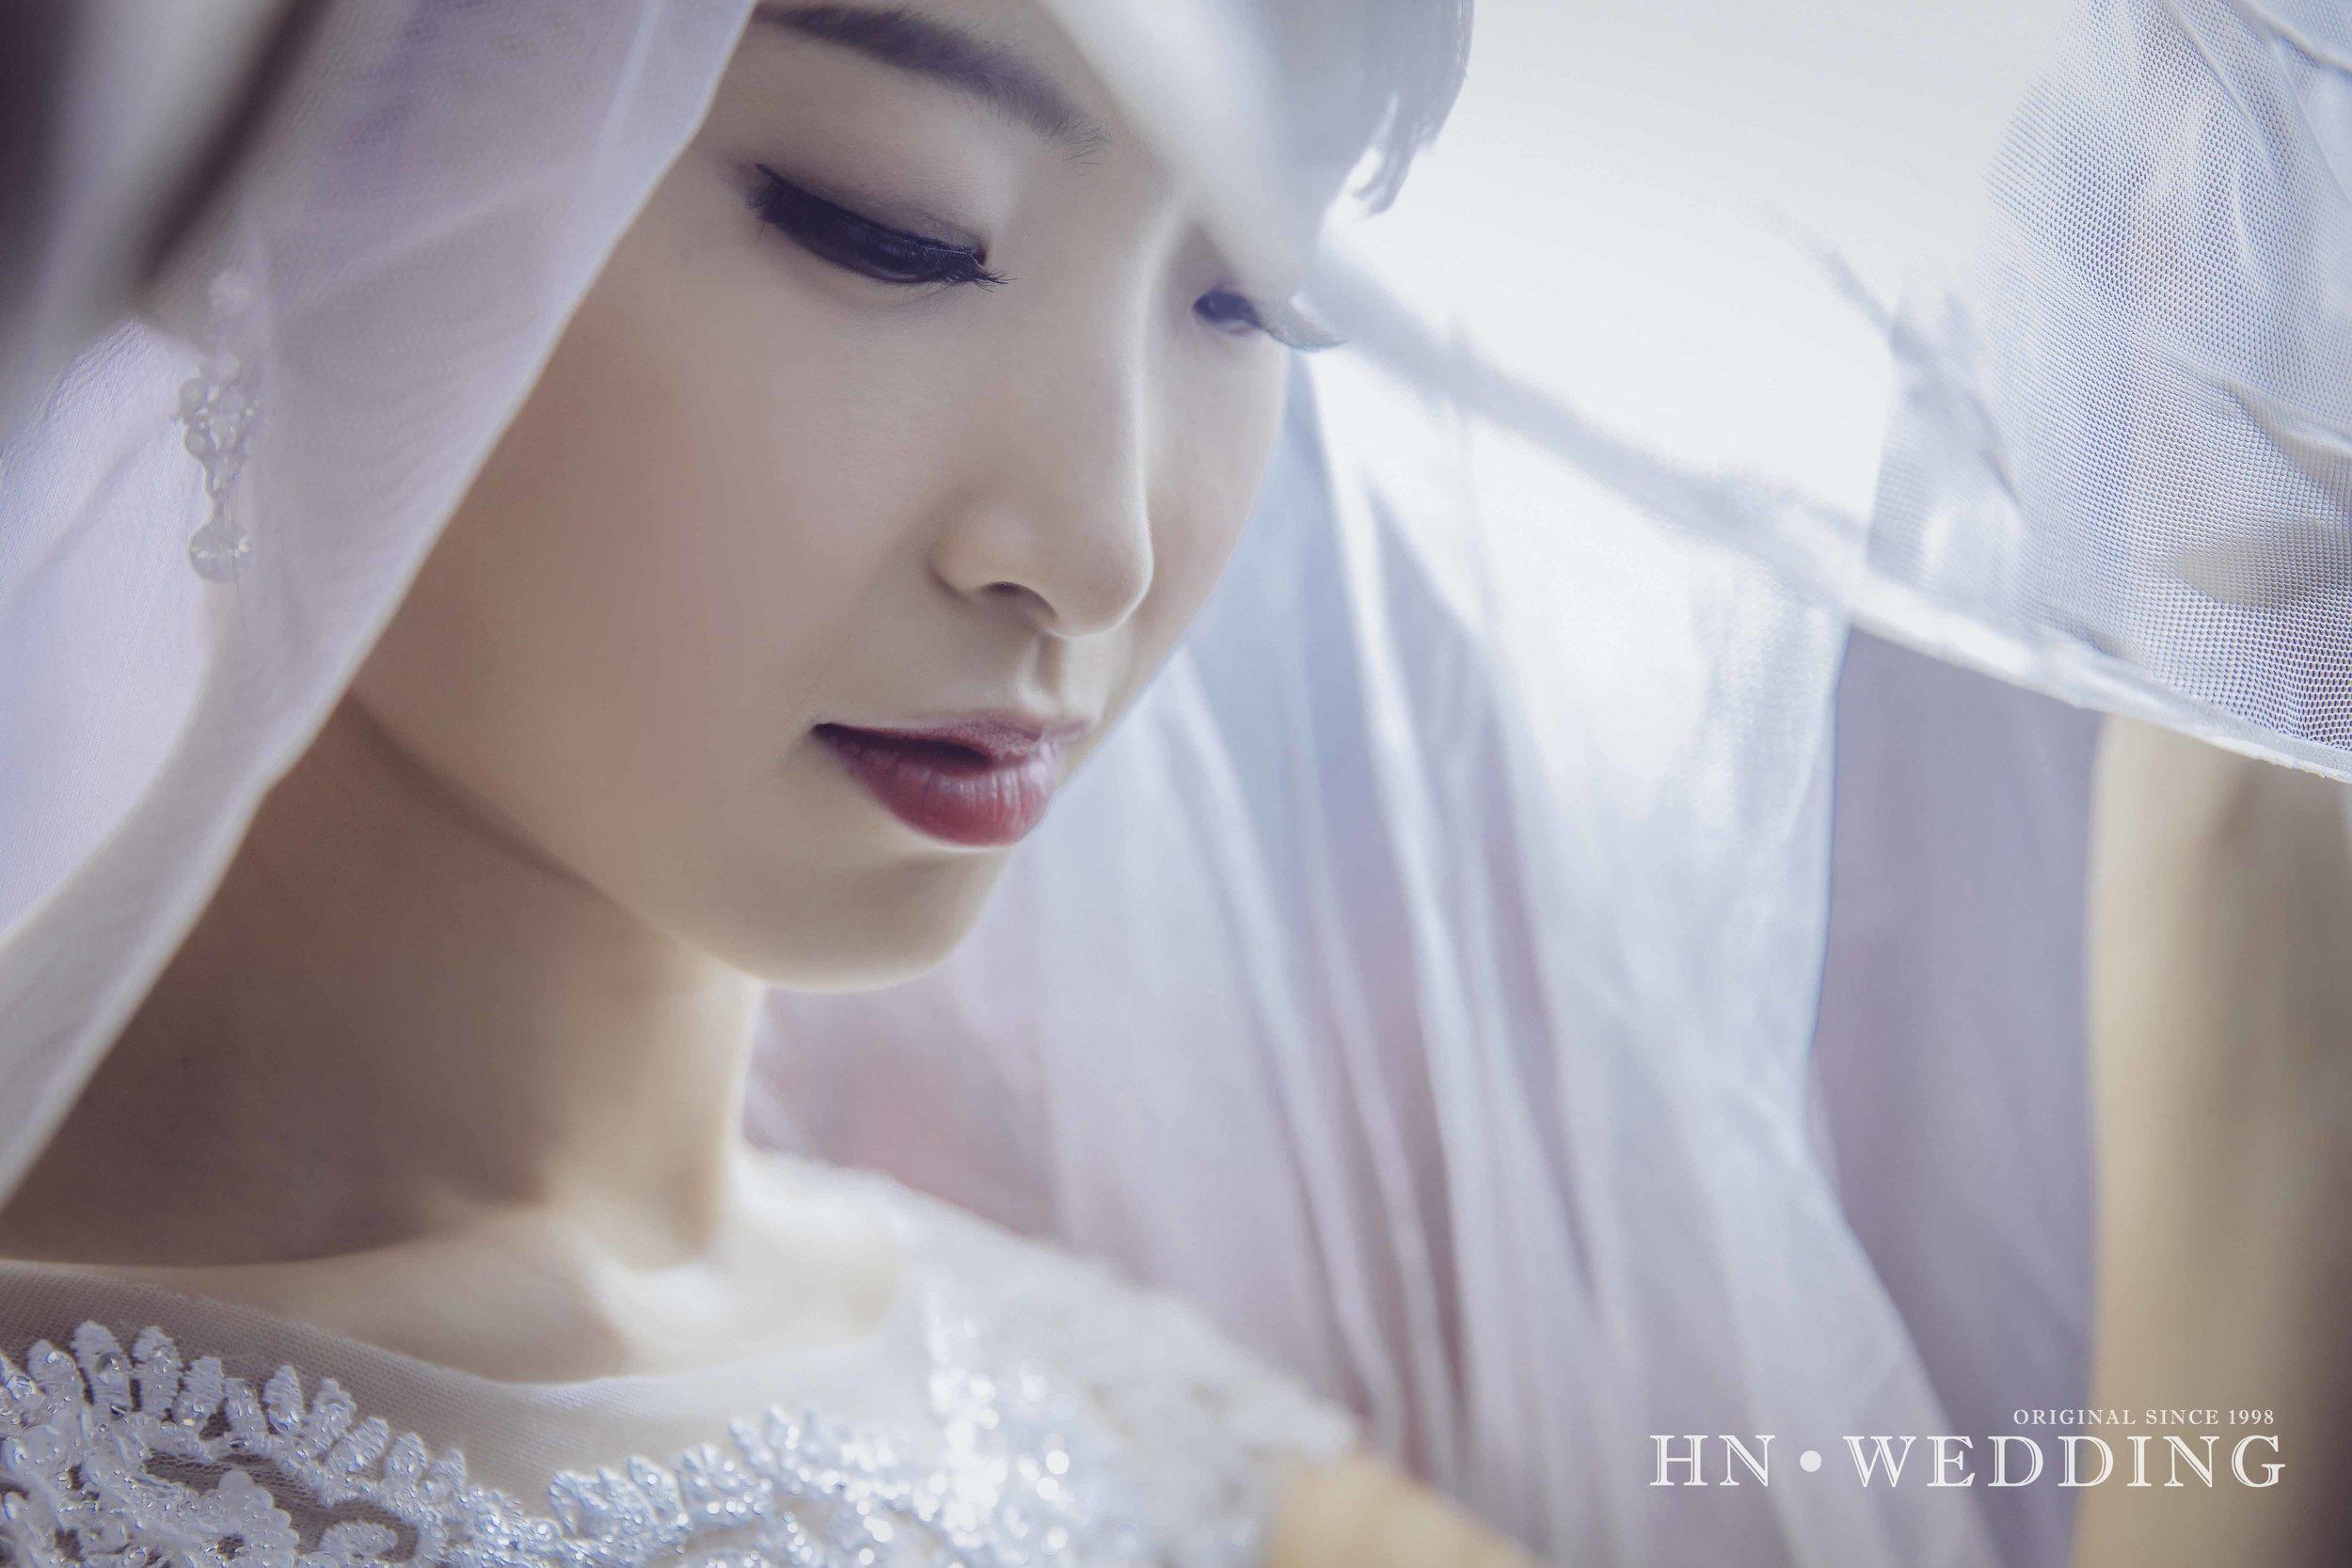 HNwedding-makeup-prewedding-9904.jpg